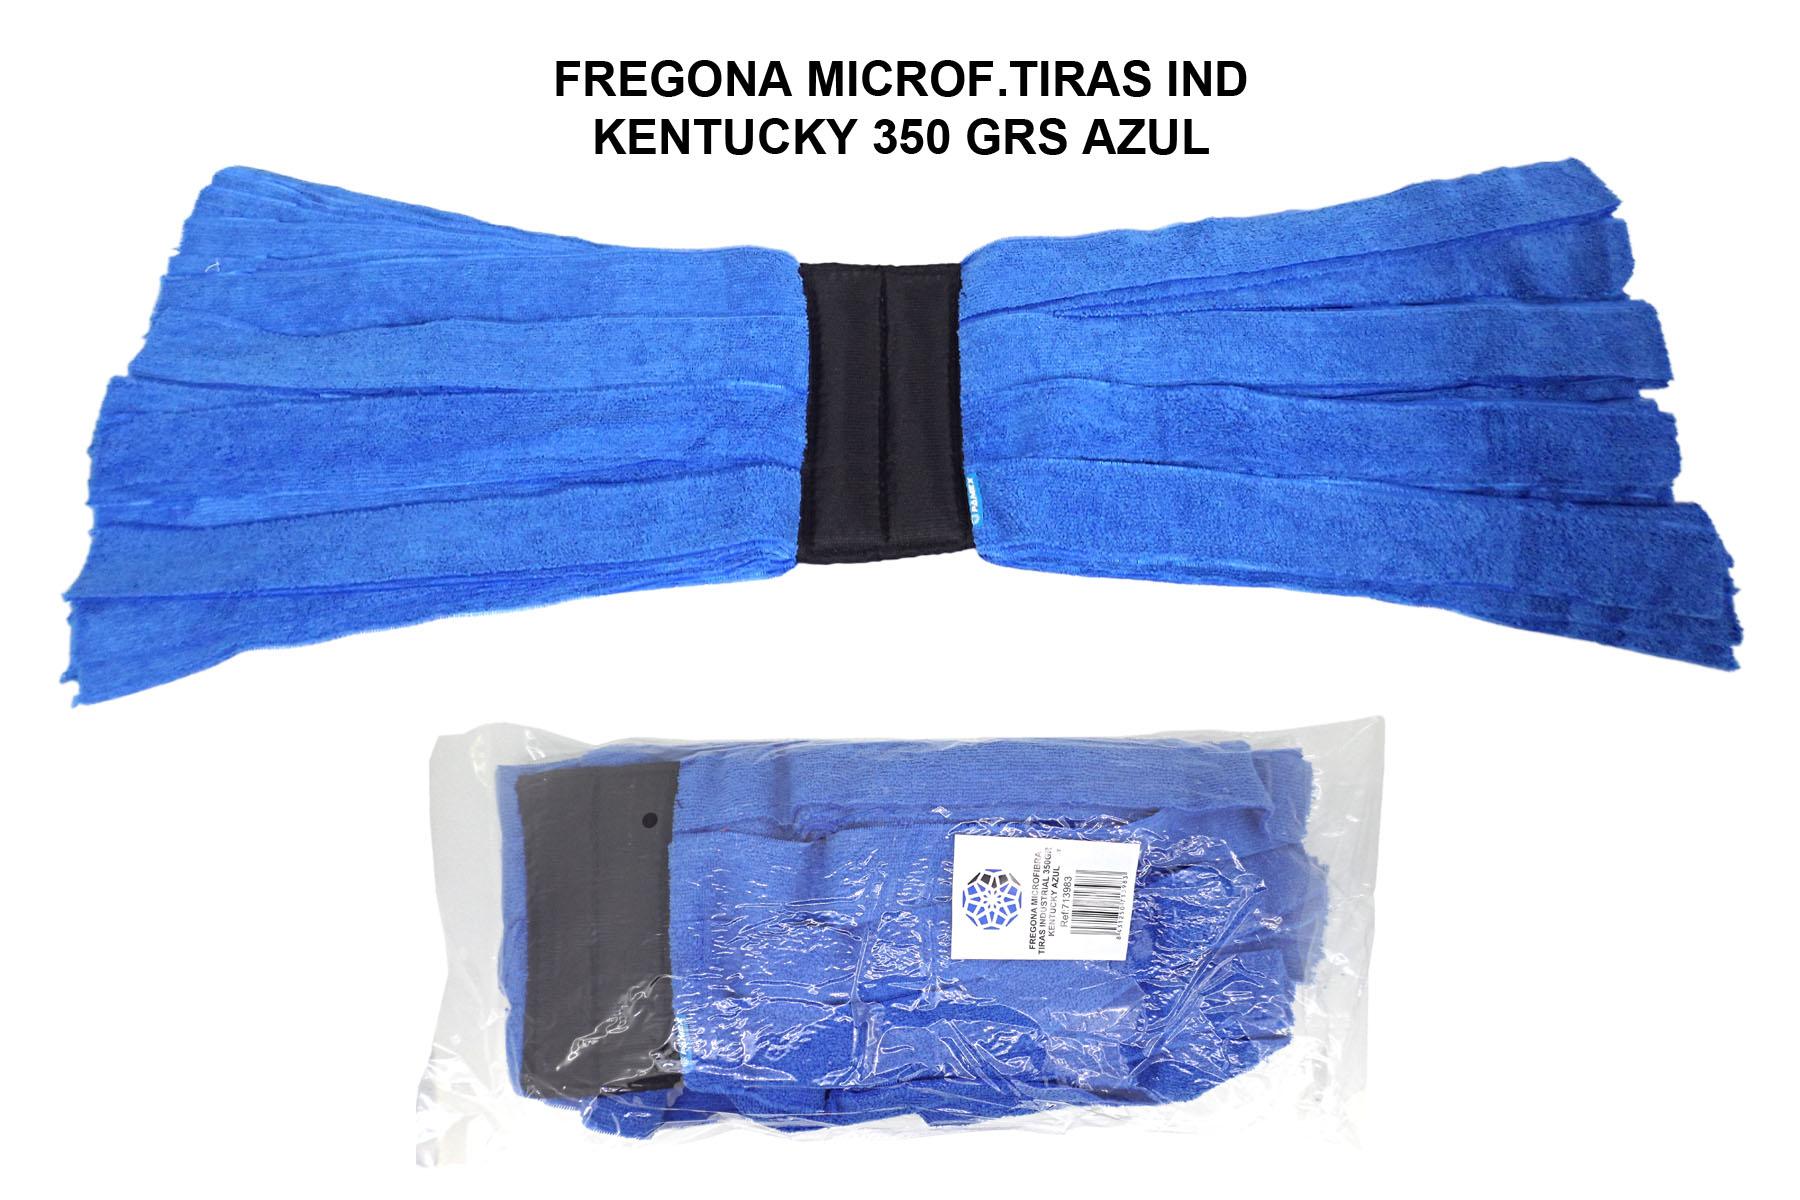 FREGONA MICROF.TIRAS IND KENTUCKY 350 GRS AZUL